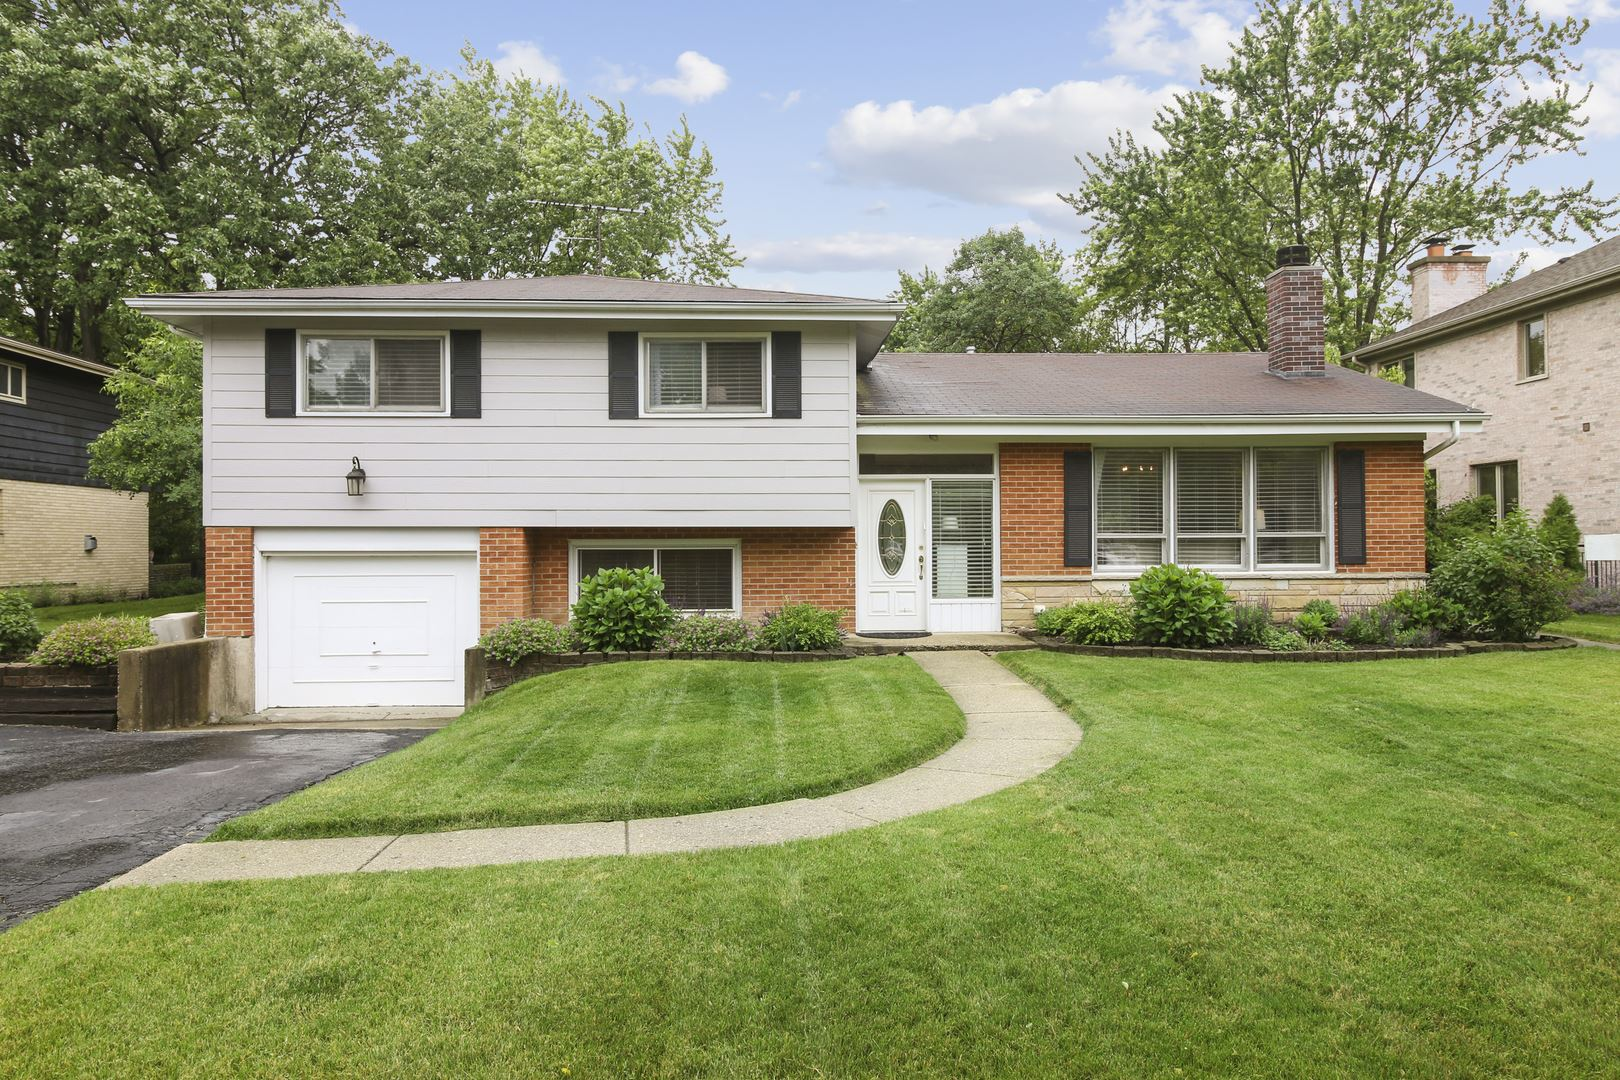 1642 Cavell Avenue, Highland Park, IL 60035 - #: 11140869